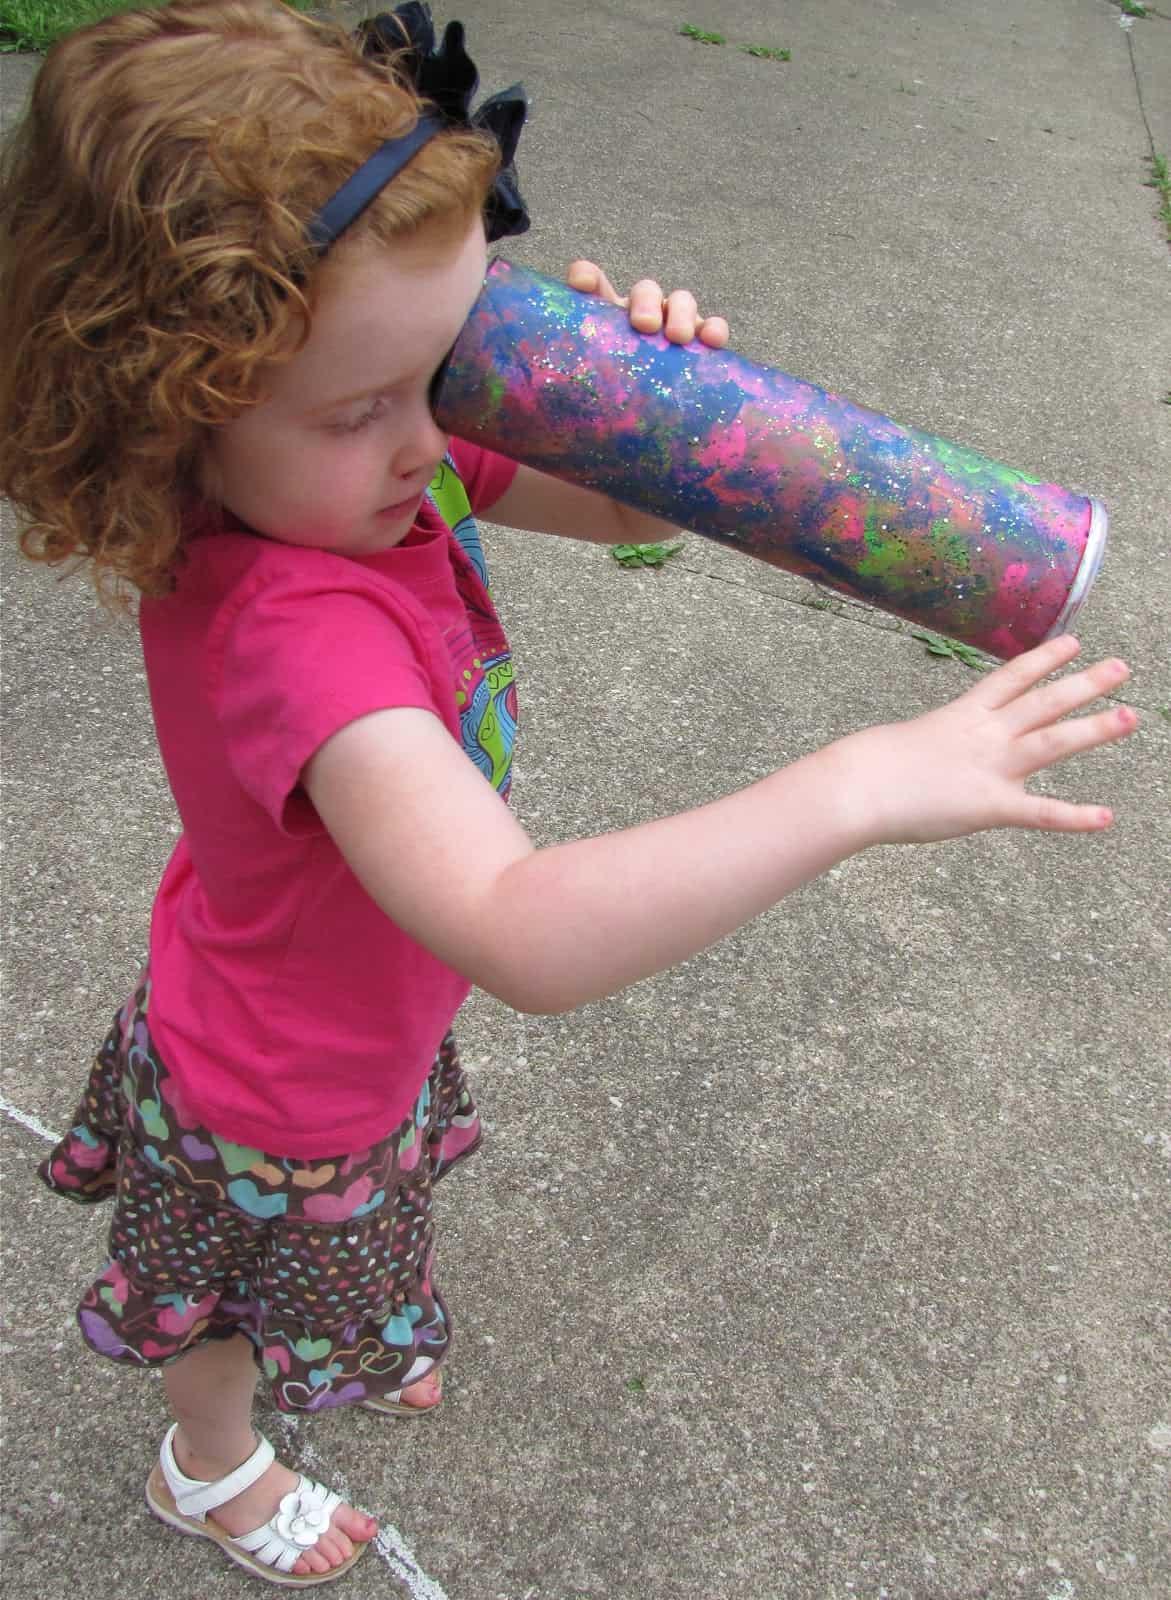 Pringles tube kaleidoscope